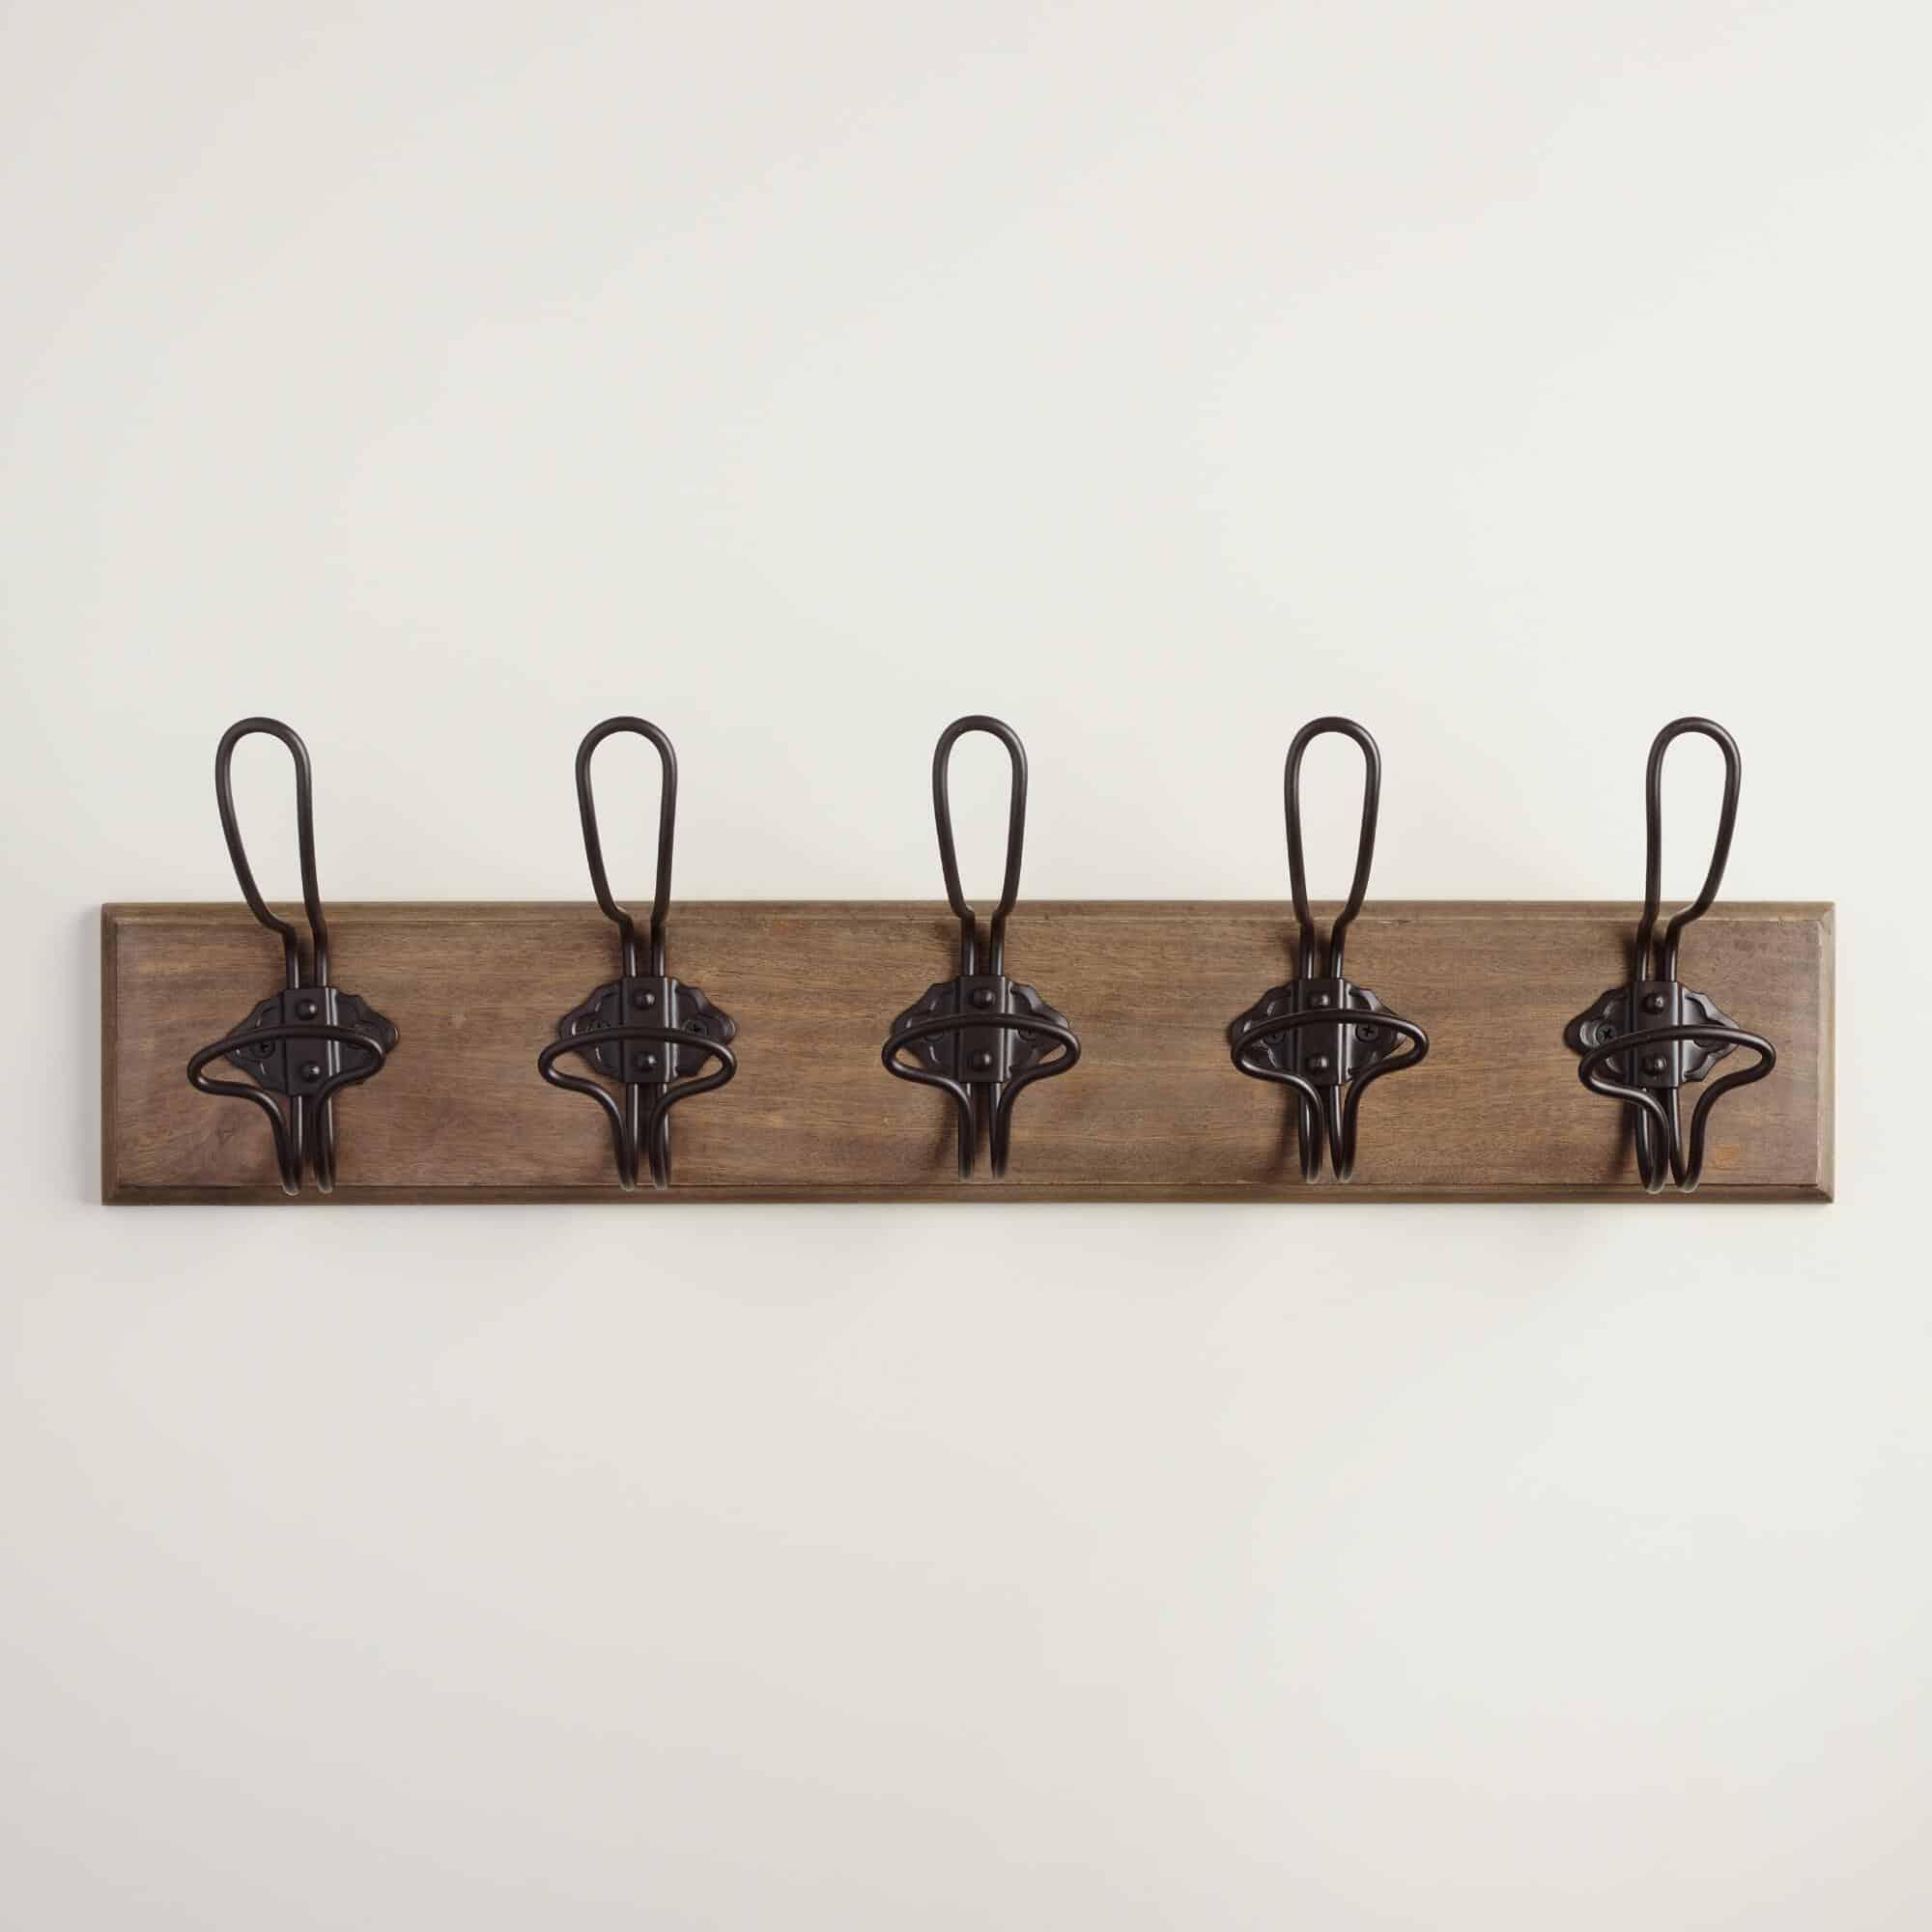 costplus rack